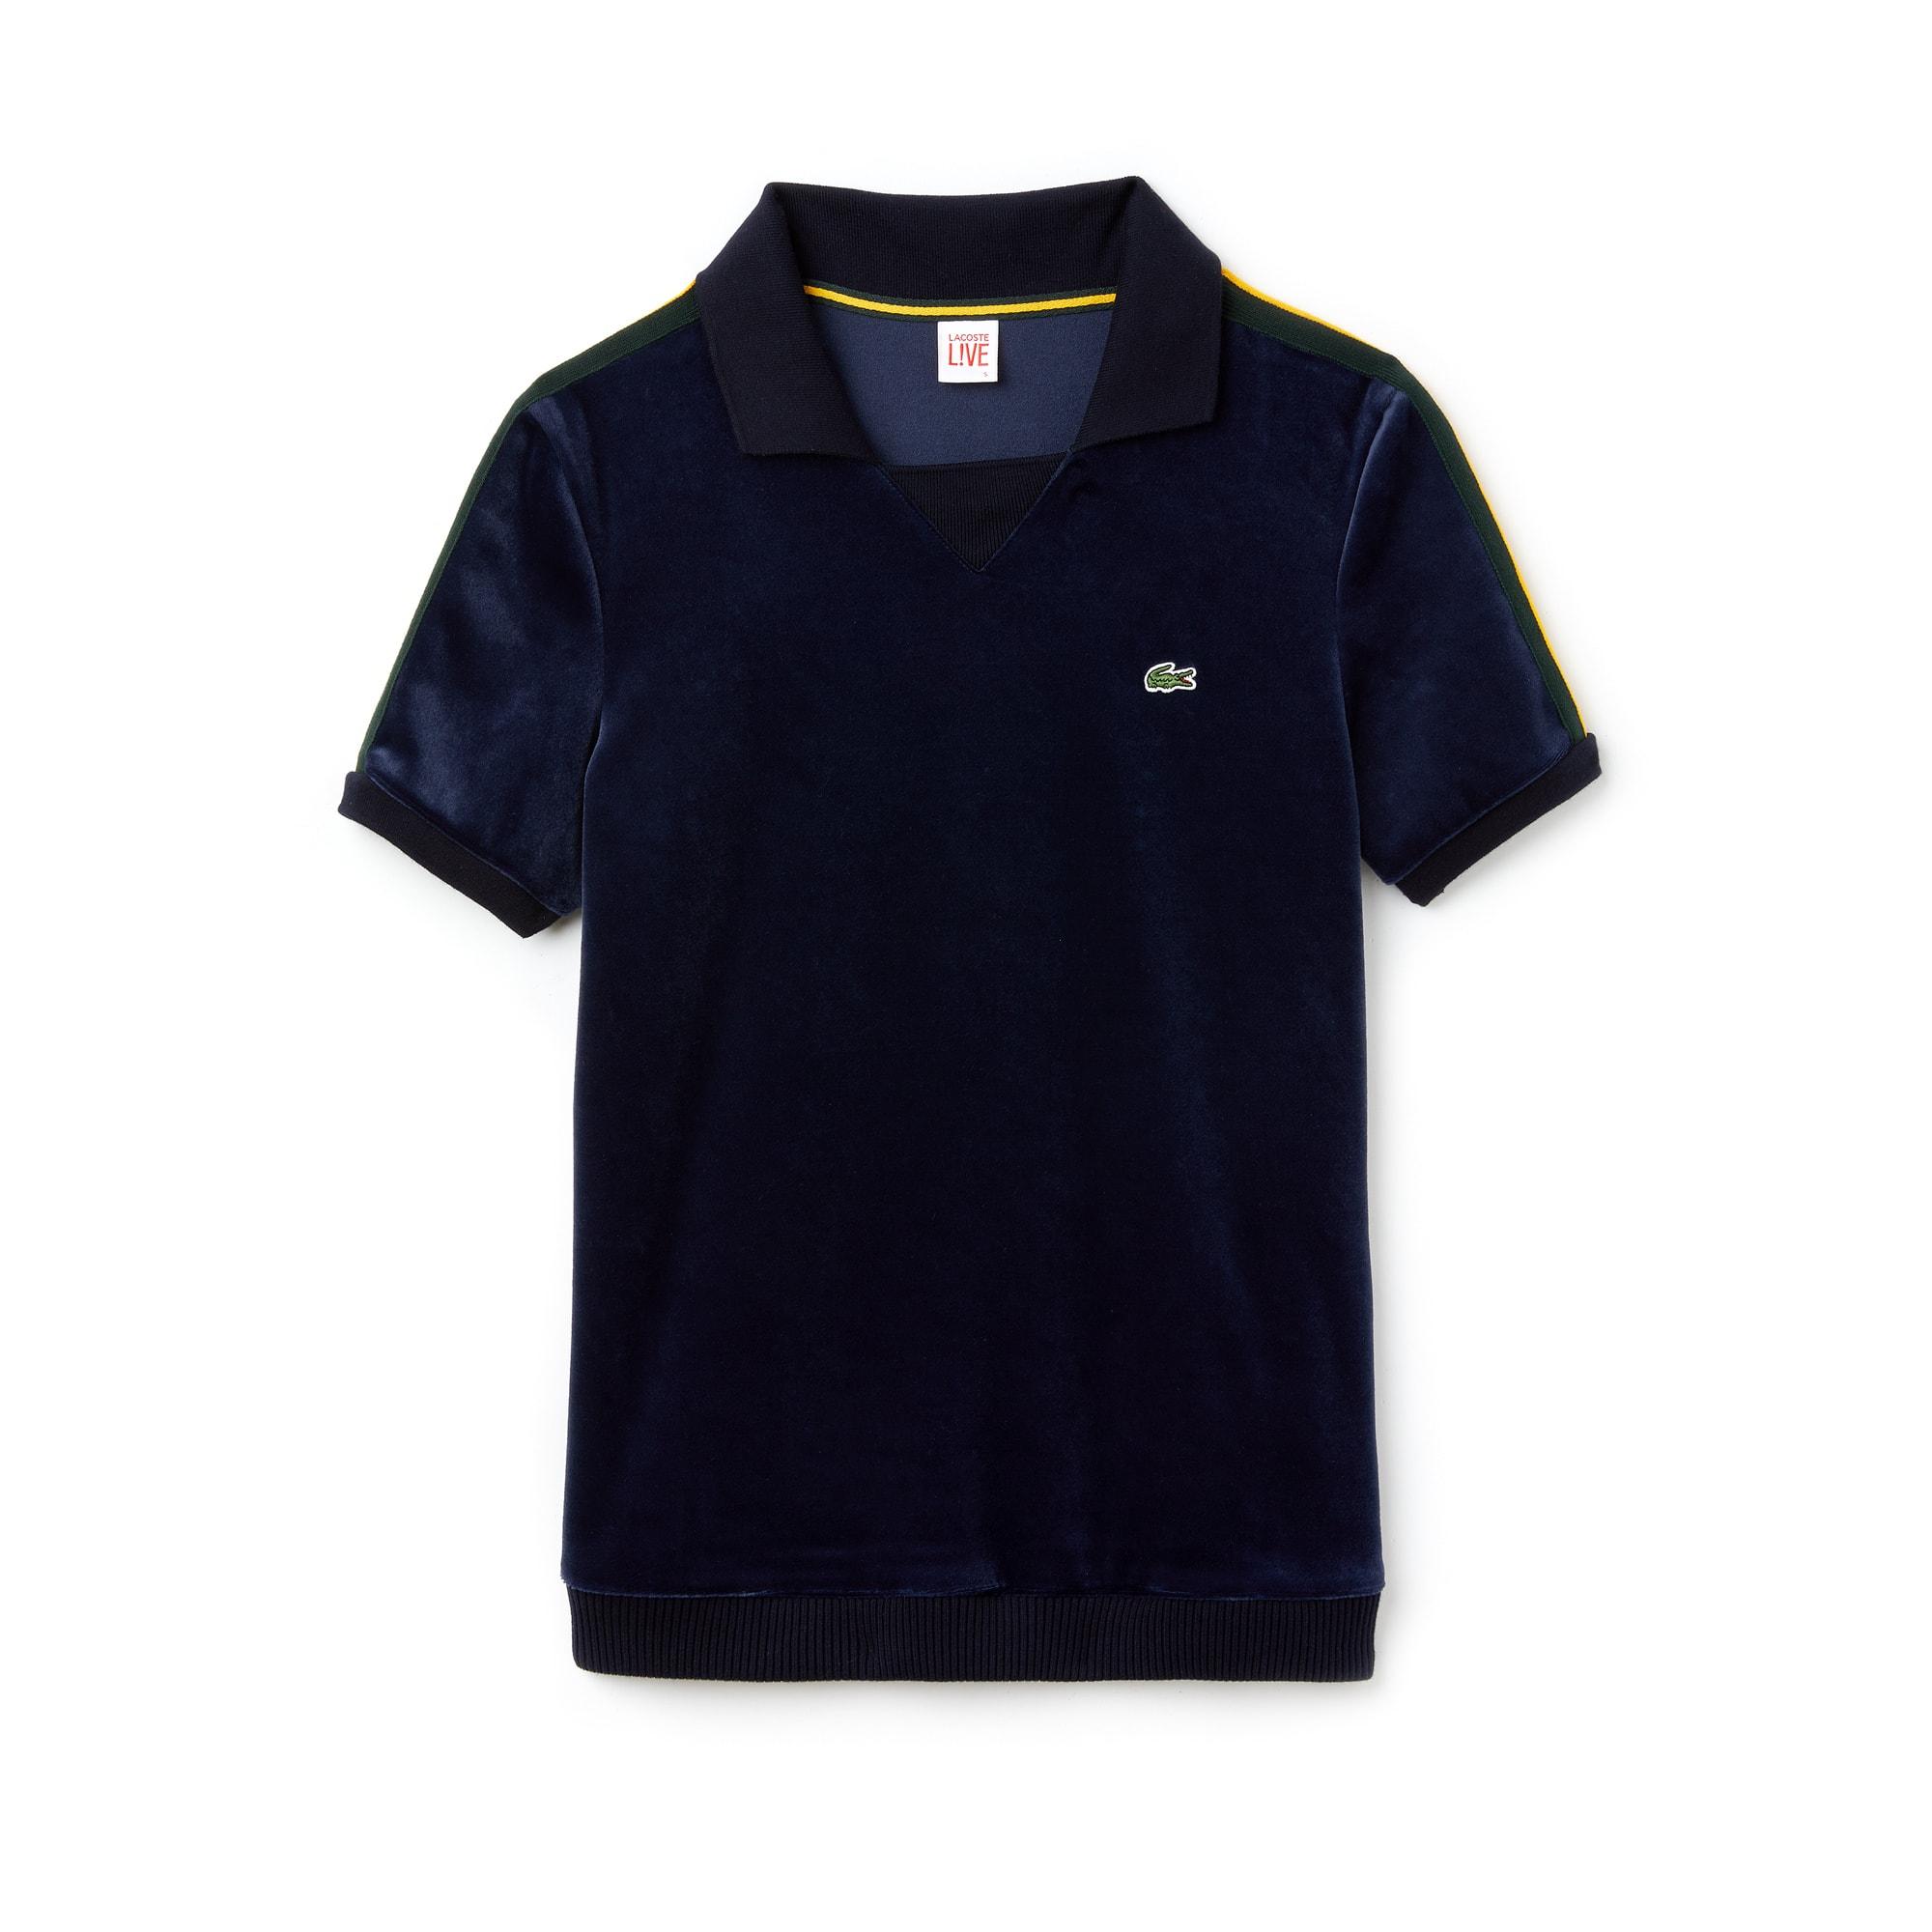 Damen LACOSTE L!VE Boxy Fit Velours-Poloshirt mit Kontraststreifen